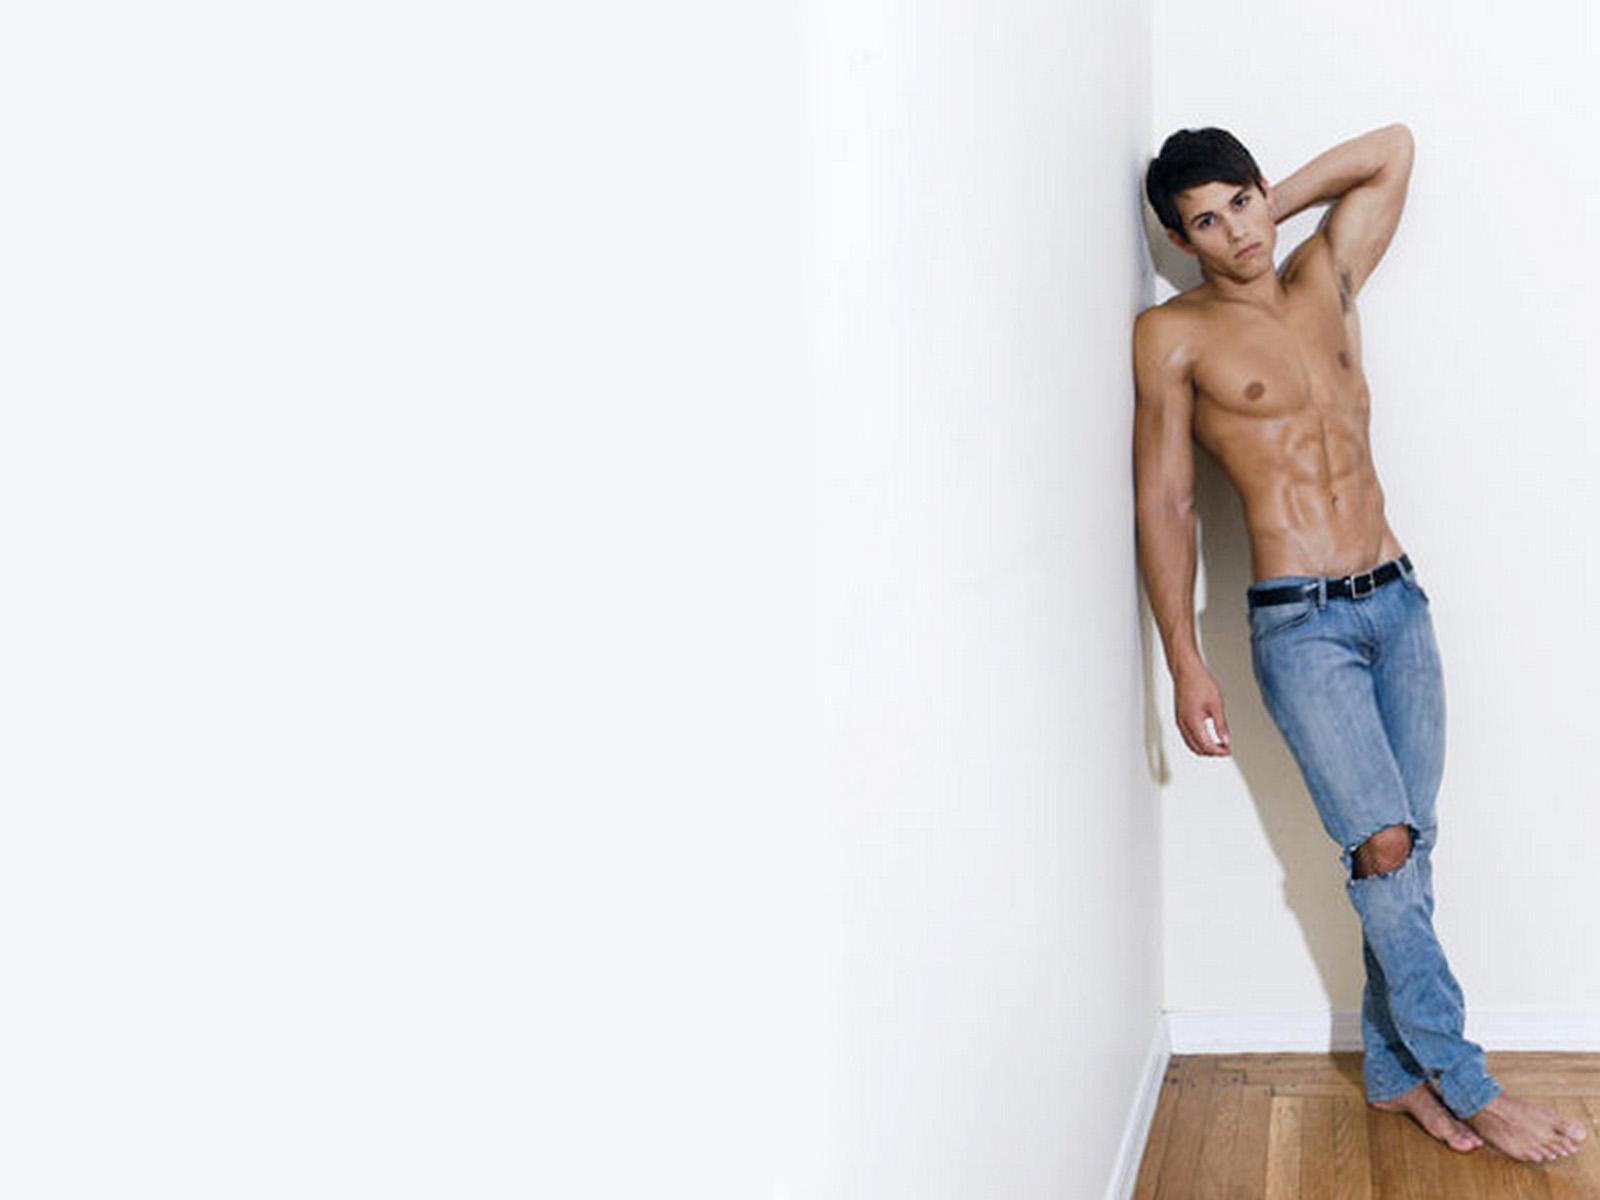 Gay Wallpapers